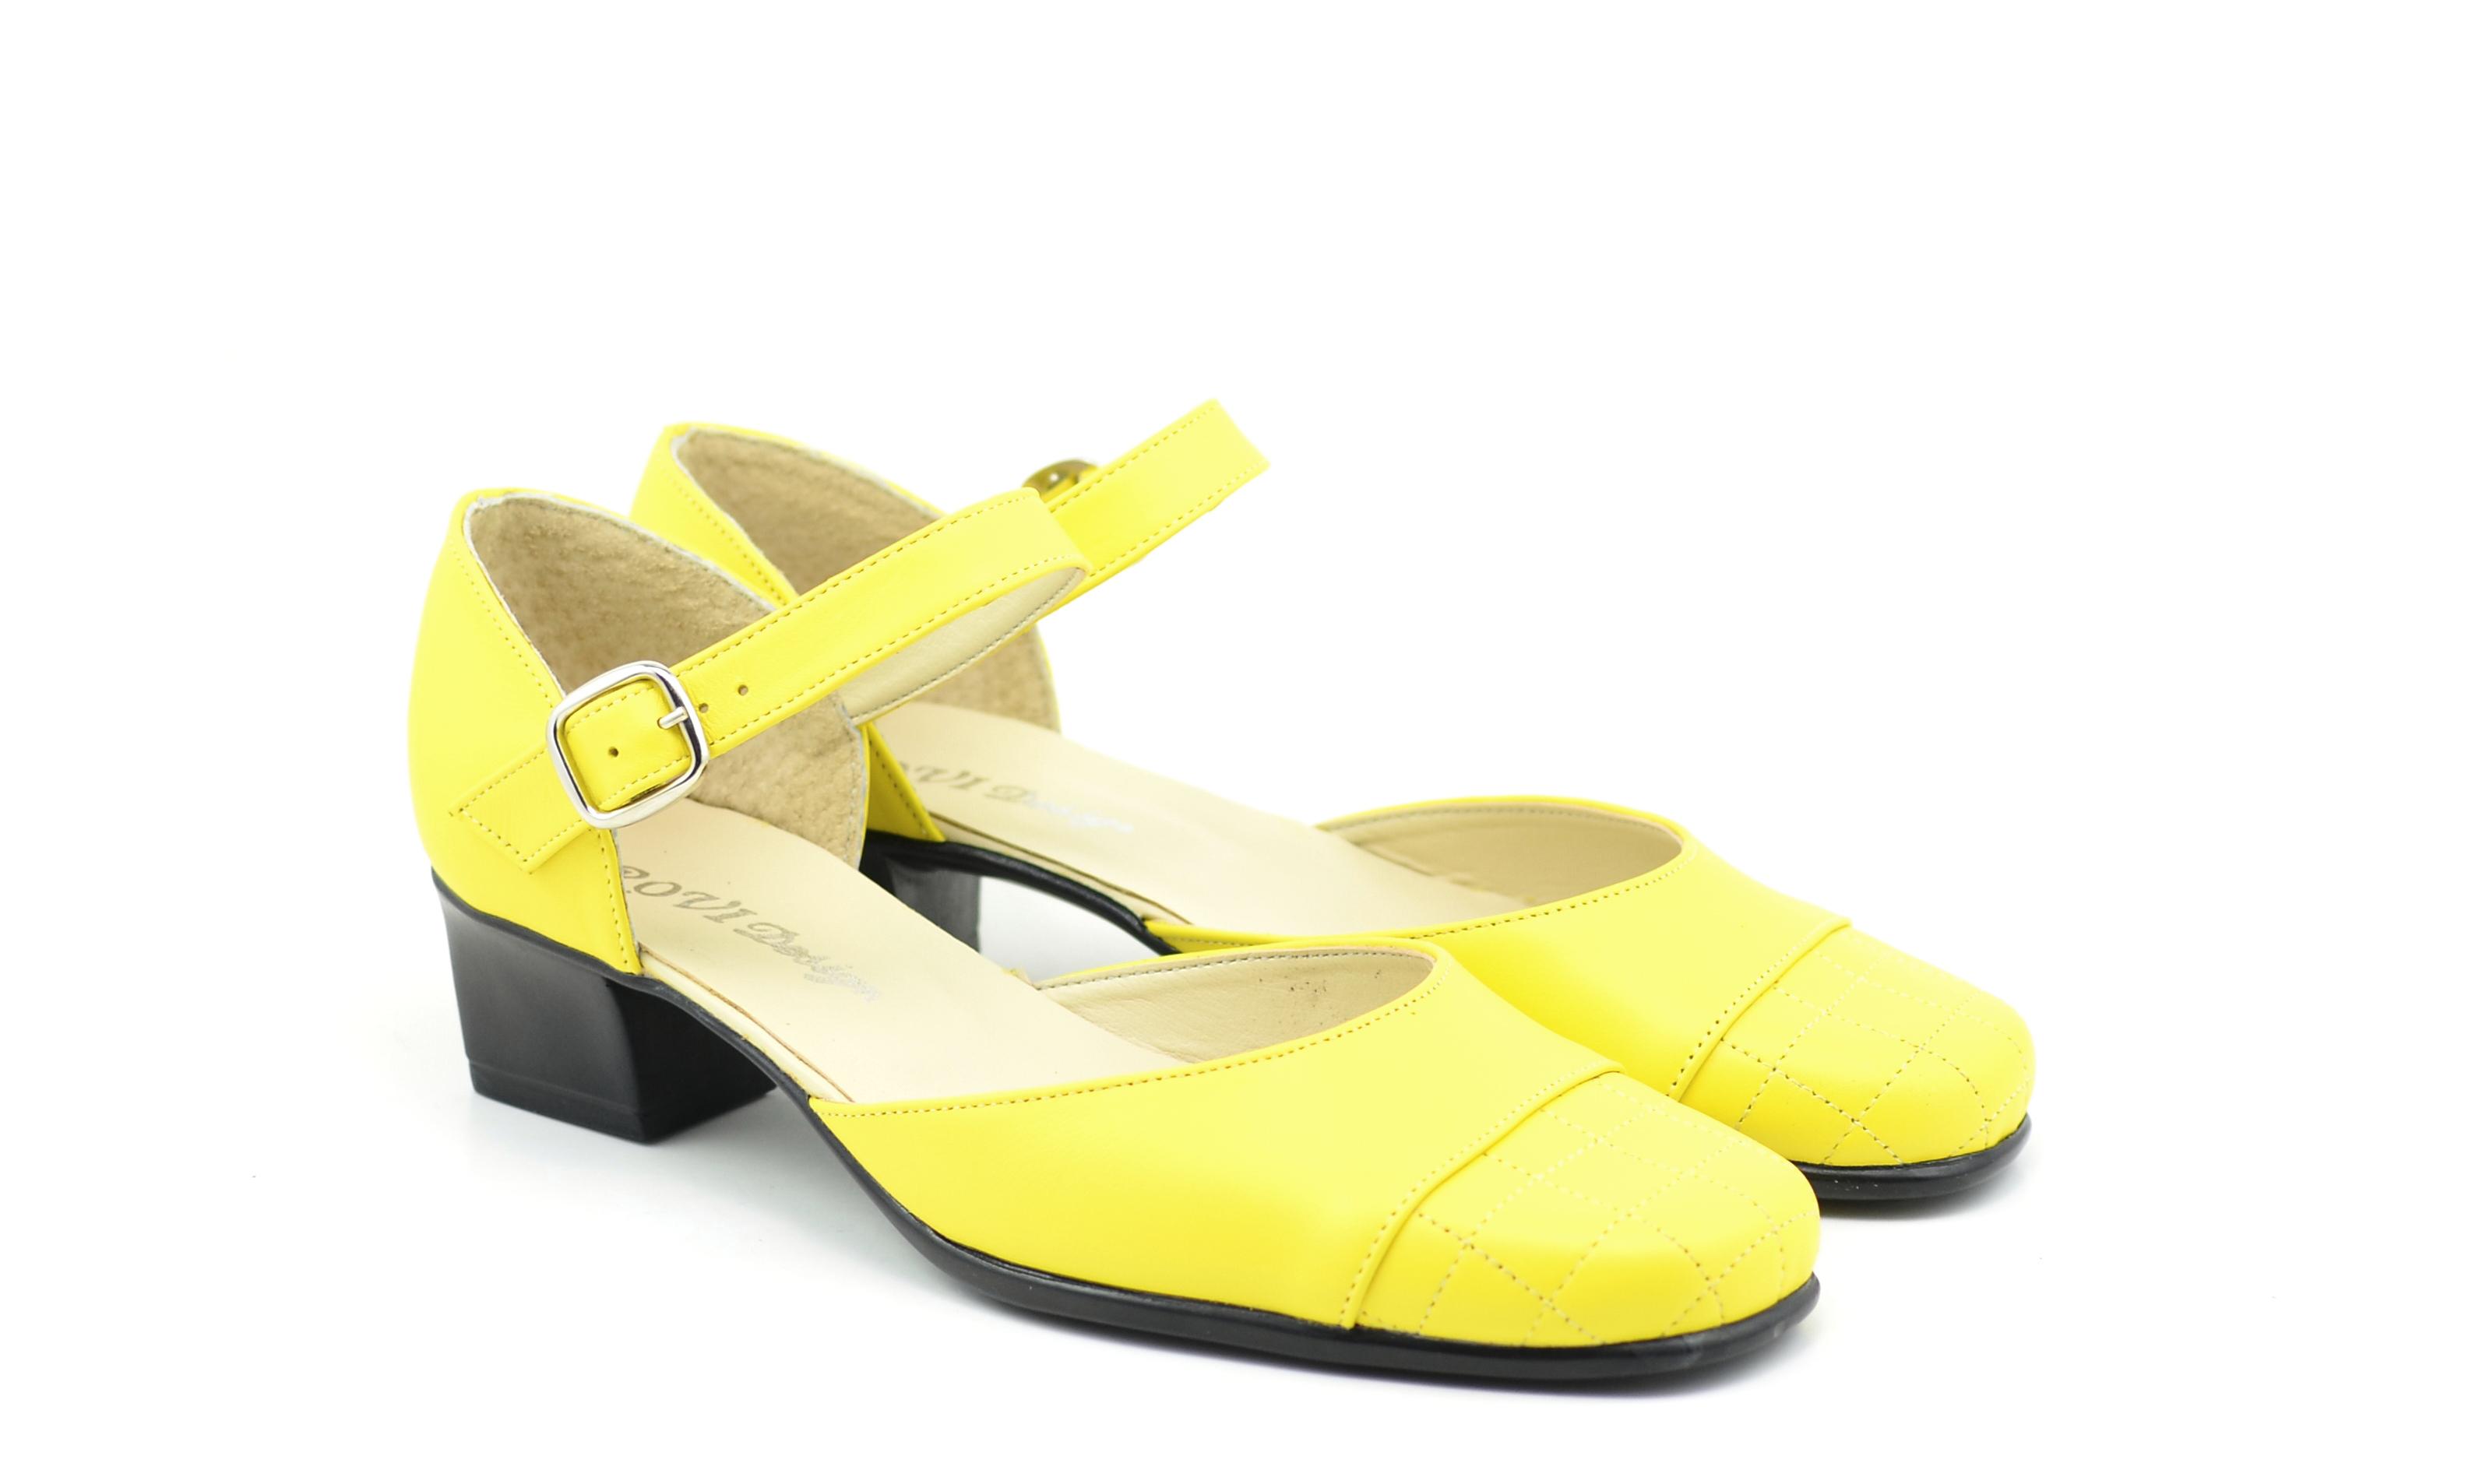 Sandale dama galbene din piele naturala - STEFY G